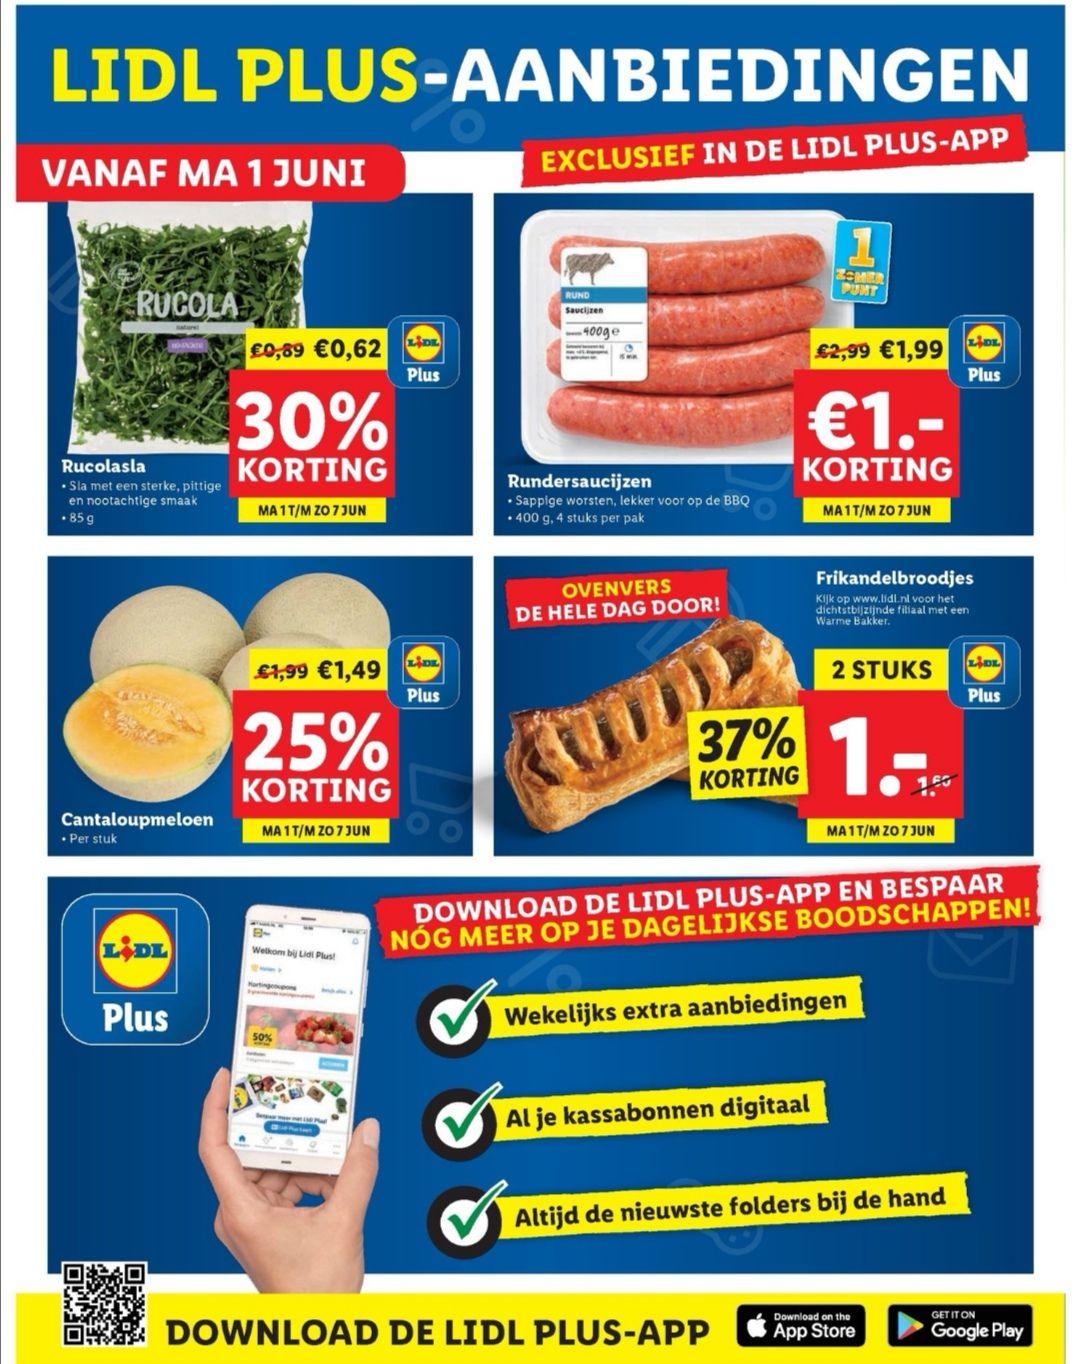 Lidl (Plus app) acties vanaf 1 juni. O.a. 2 Frikandelbroodjes voor € 1